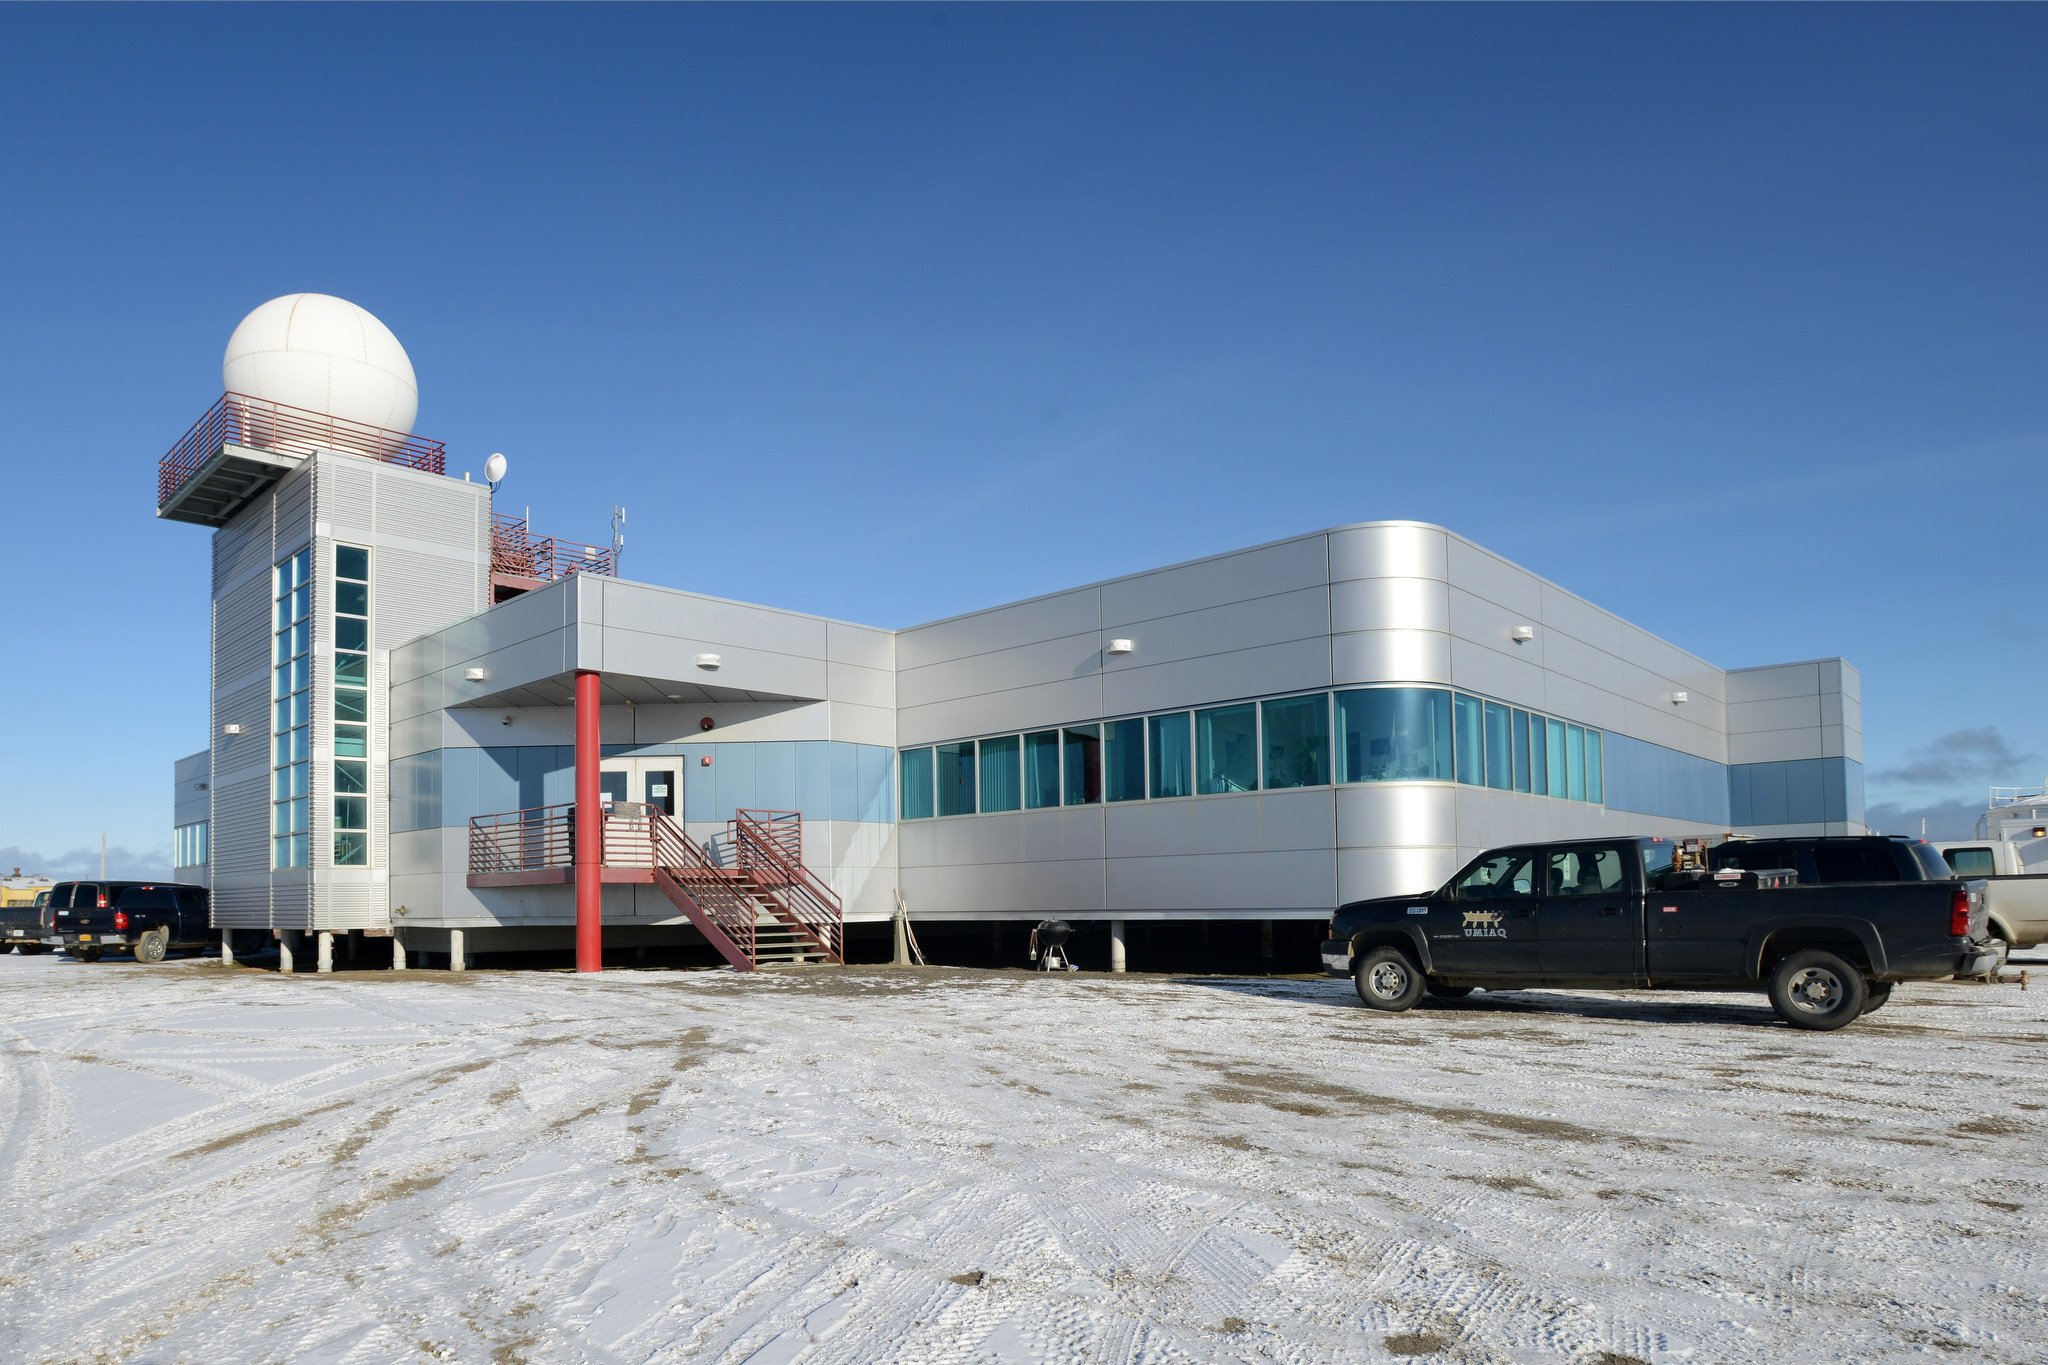 The Barrow Arctic Research Center photographed on Wednesday, September 23, 2015, in Barrow. (Erik Hill / Alaska Dispatch News)